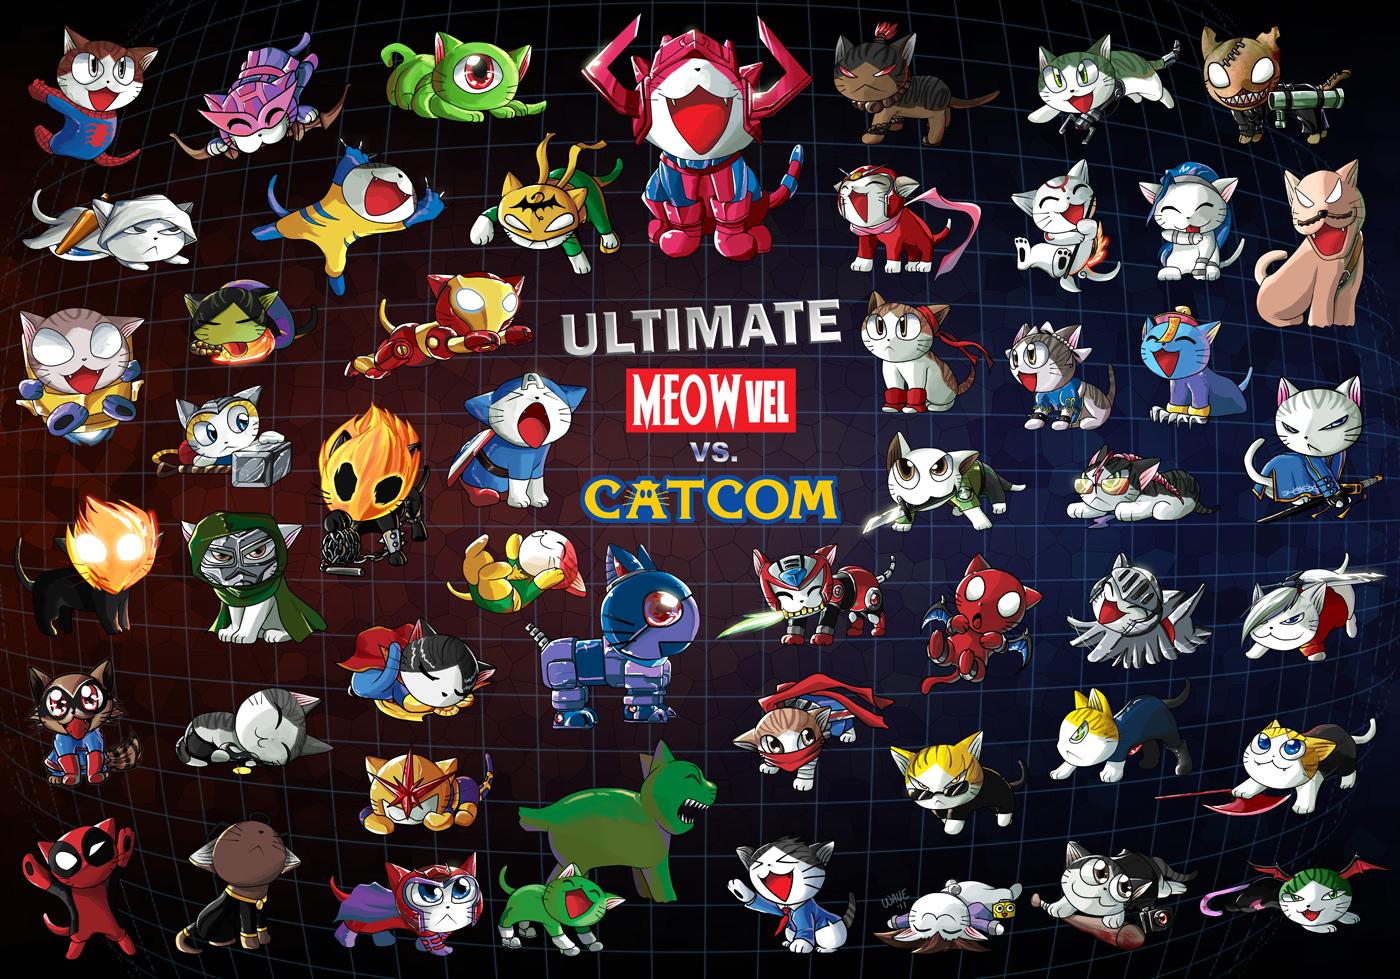 Ultimate Meowvel vs Catcom 3